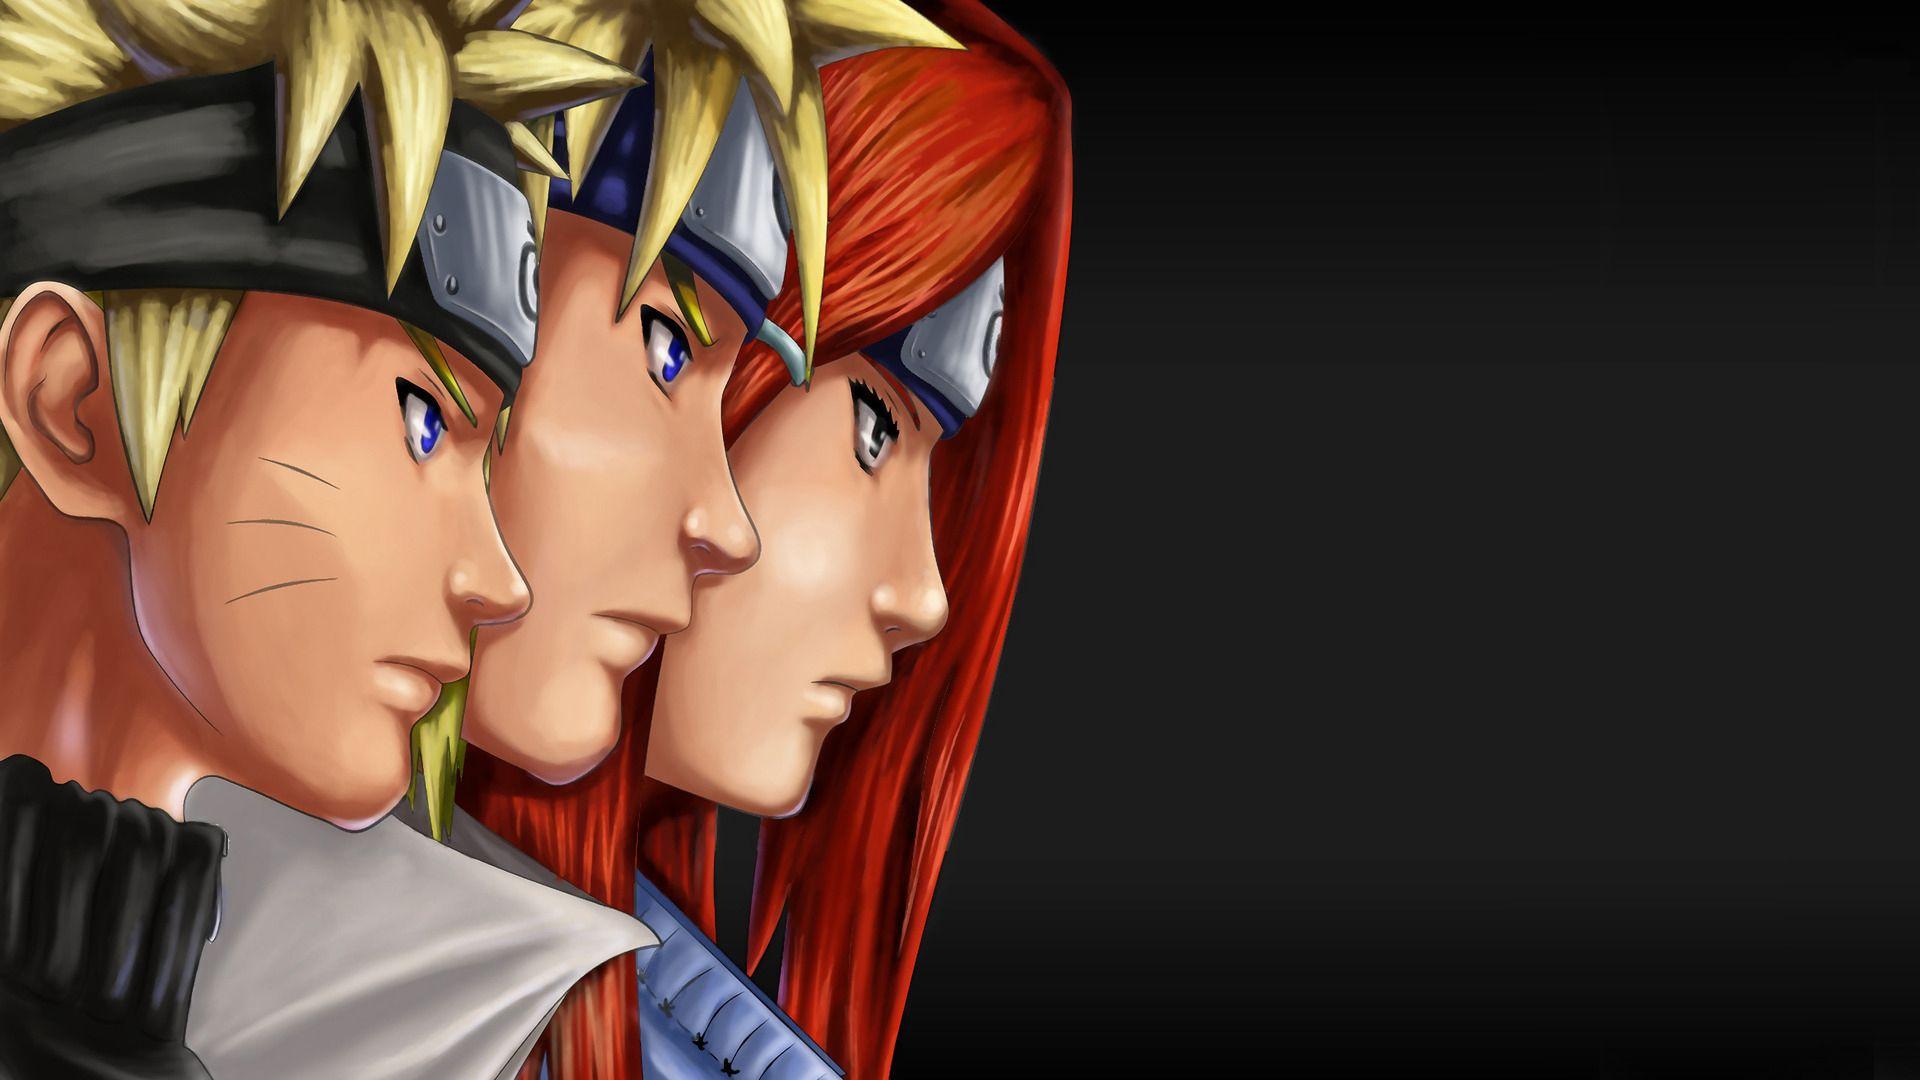 Naruto's Family Anime Wallpaper